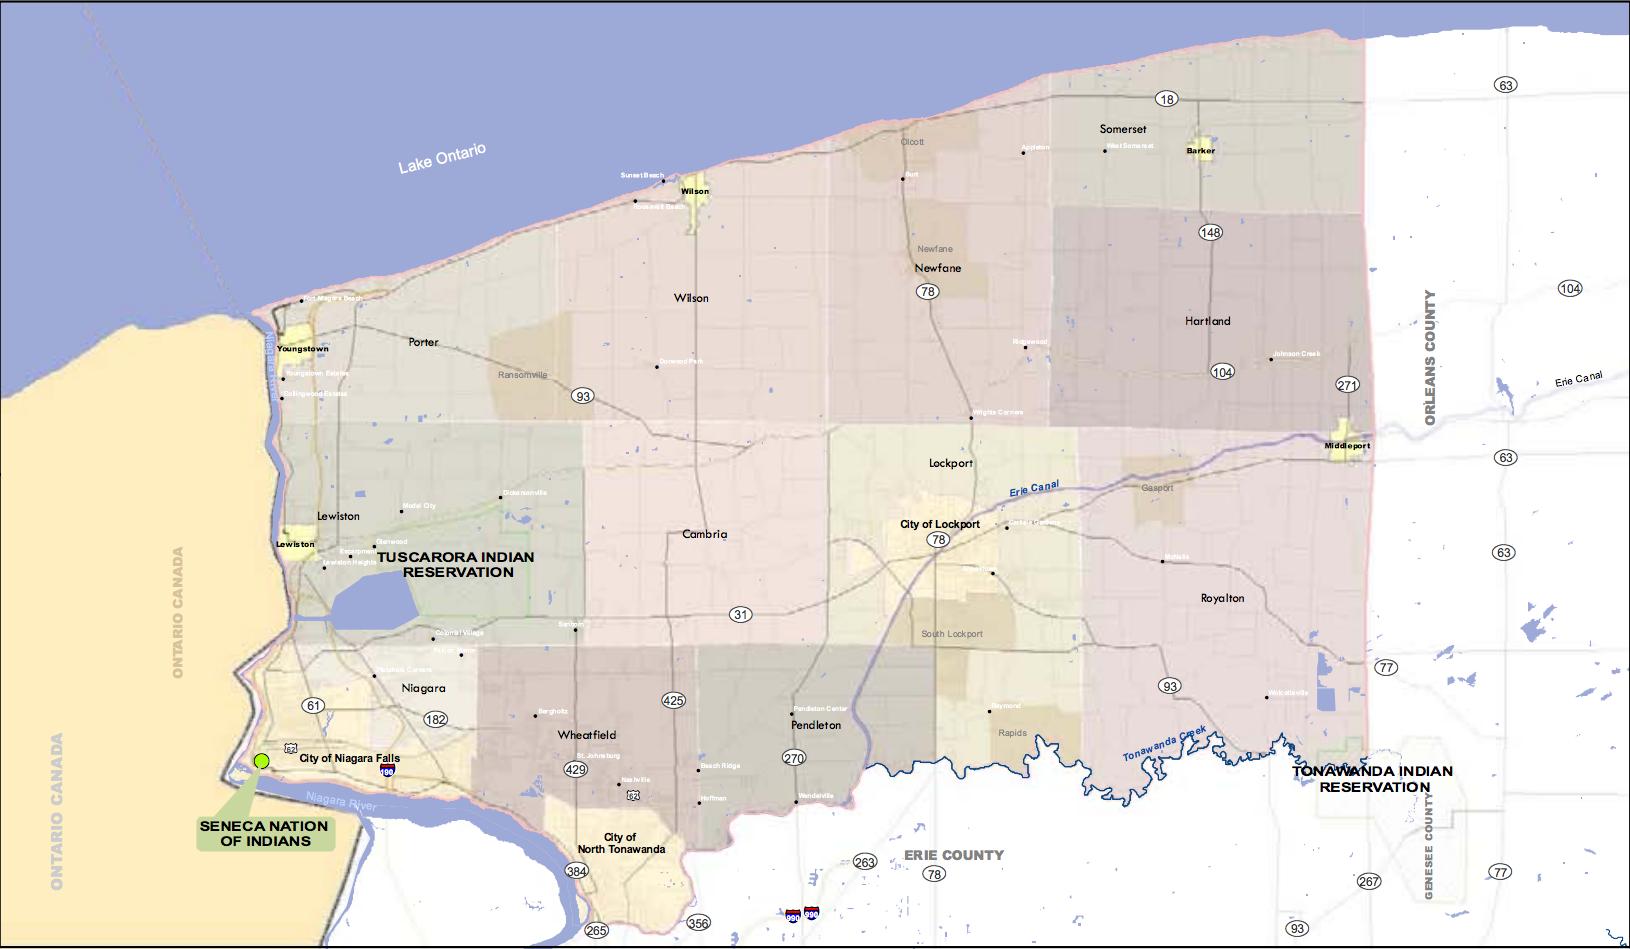 Niagara Falls Zip Code Map.Bill Rapaport S Buffalo Restaurant Guide The Restaurants By Location